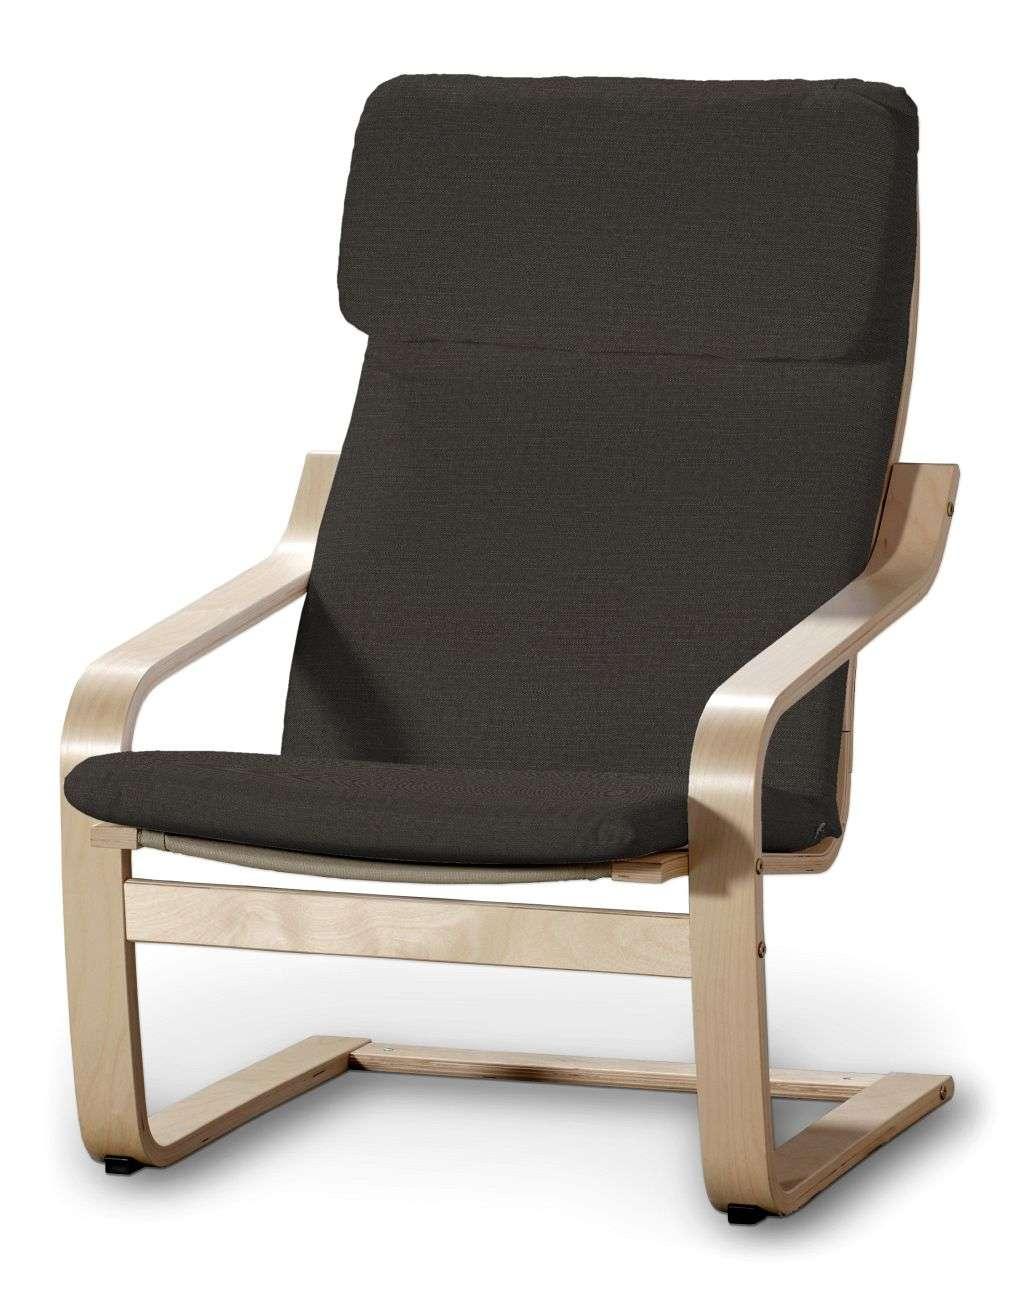 POÄNG  fotelio užvalkalas Poäng armchair kolekcijoje Vintage, audinys: 702-36